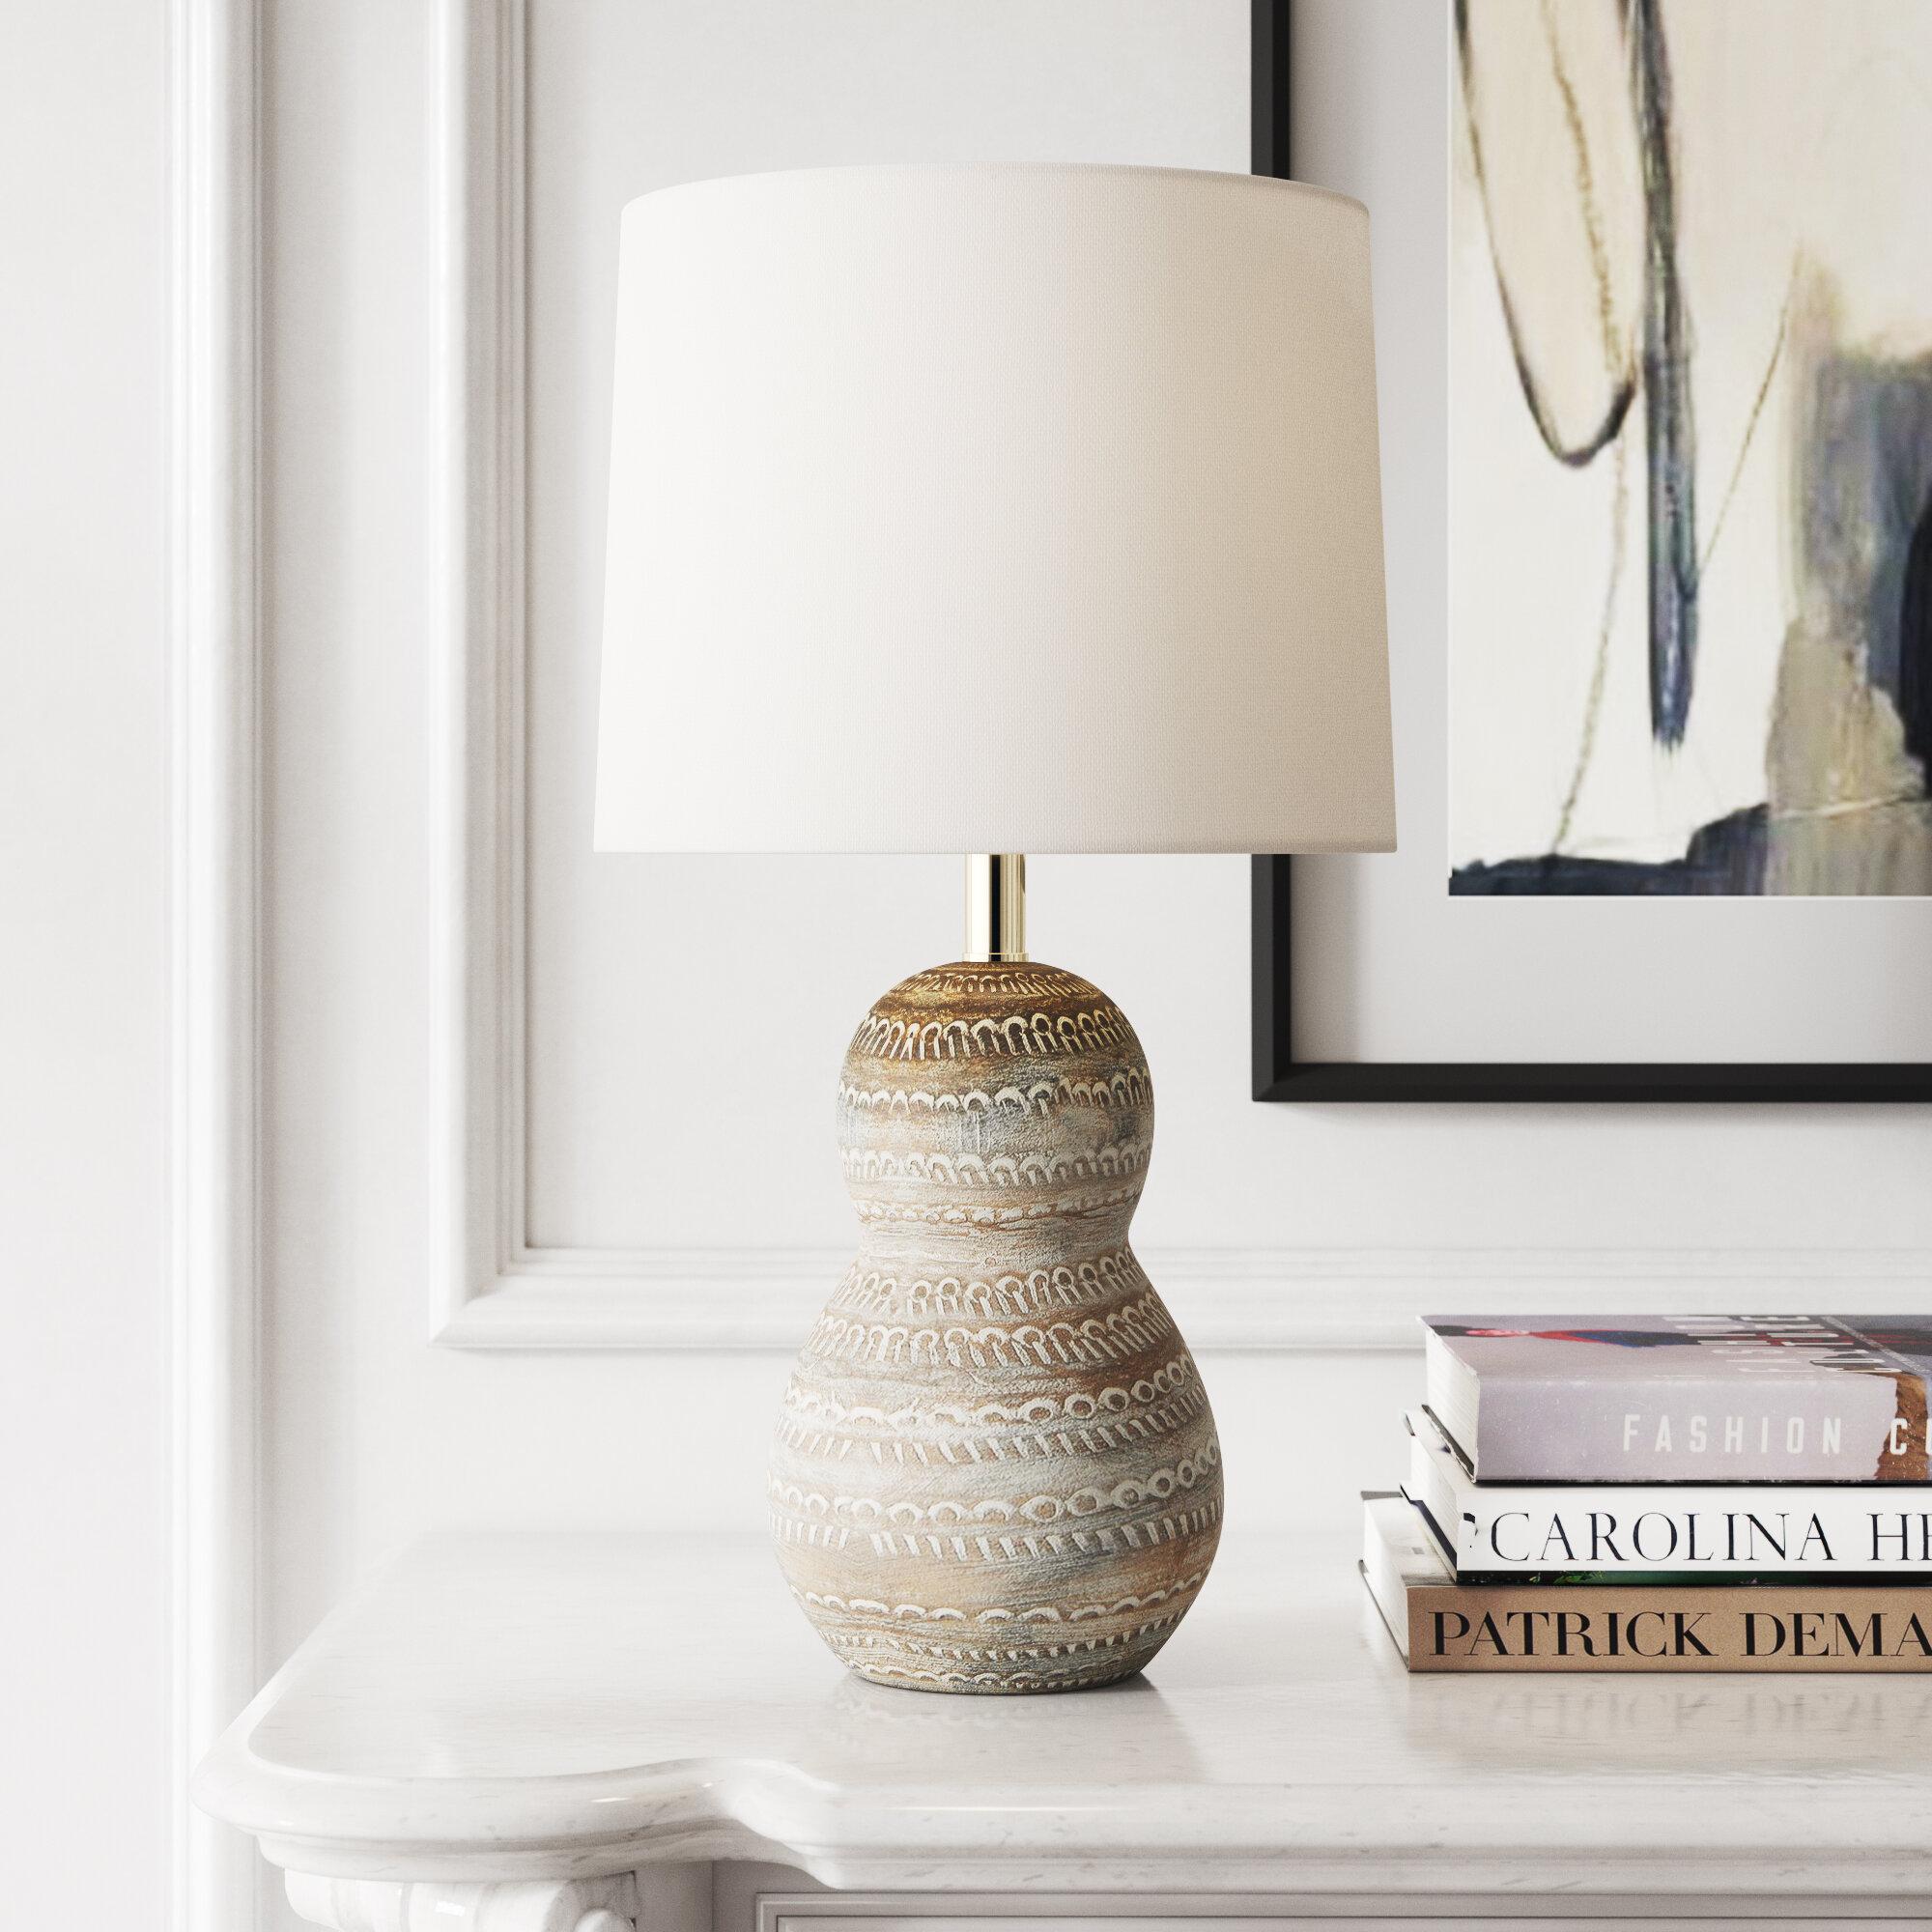 Farmhouse Table Lamps You Ll Love In 2021 Wayfair